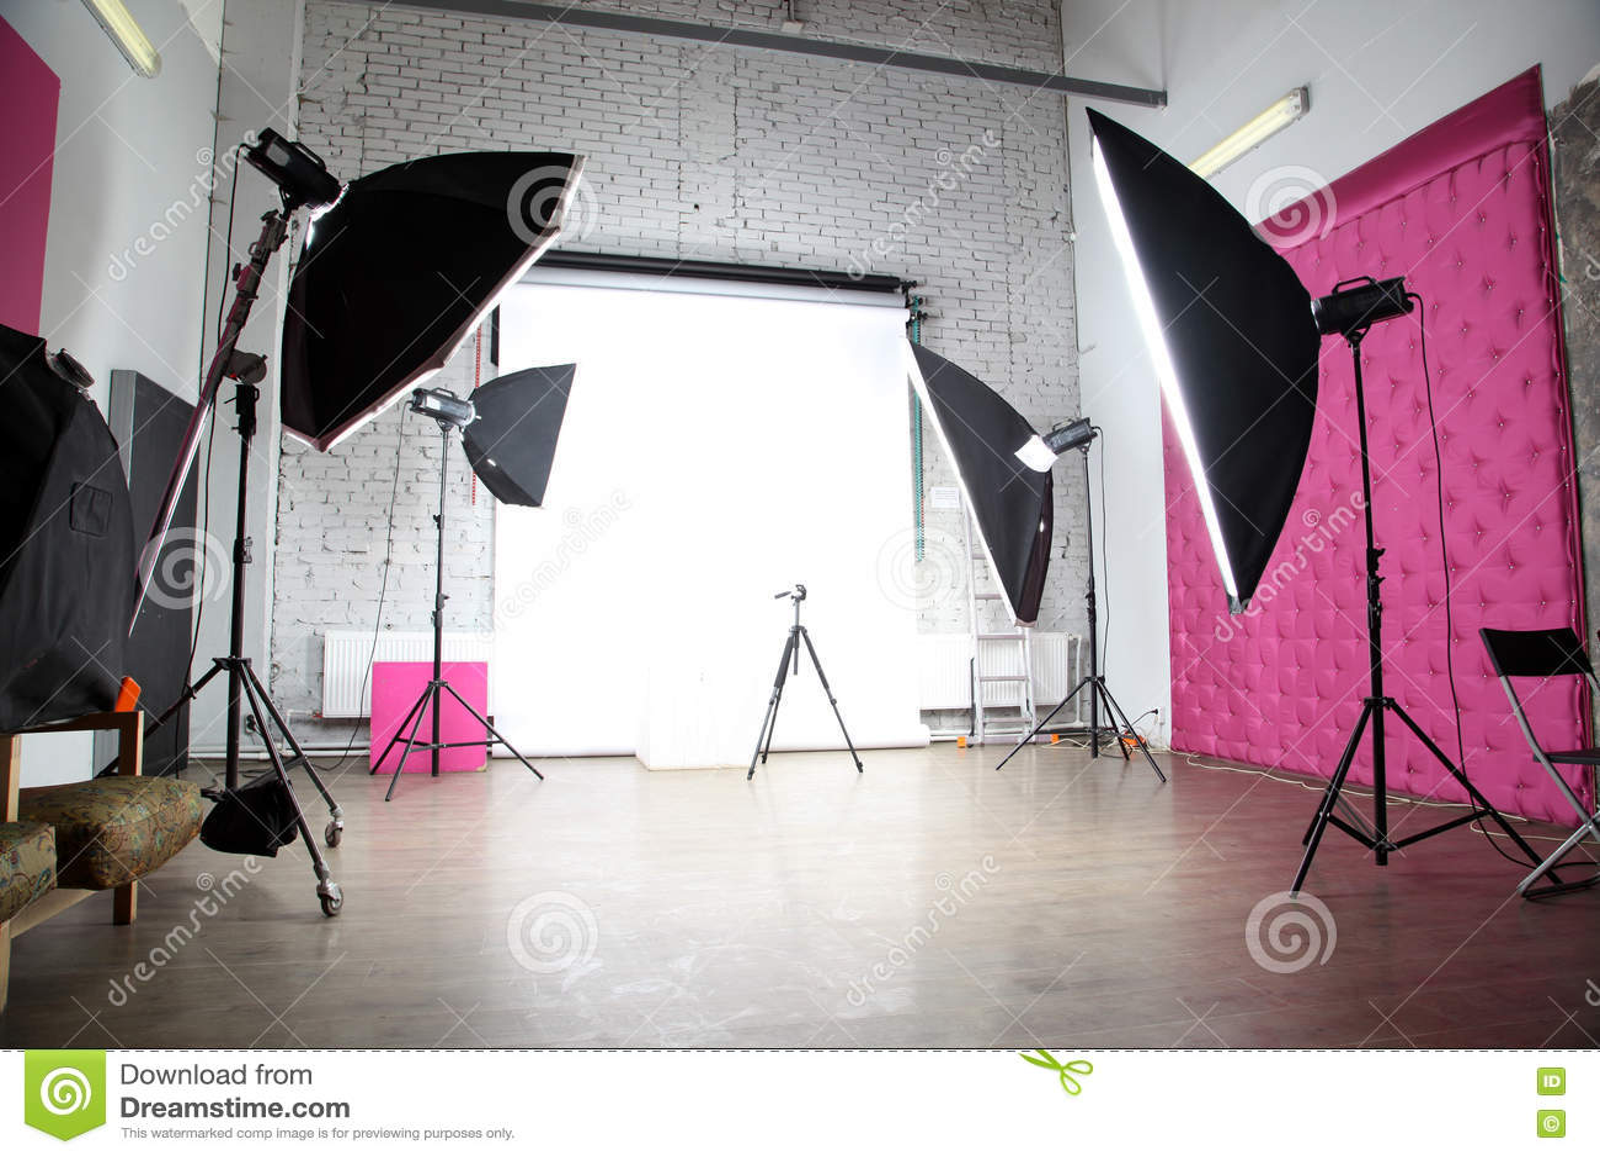 https://thumbs.dreamstime.com/z/int%C3%A9rieur-d-un-studio-moderne-de-vid%C3%A9o-de-photo-77296141.jpg